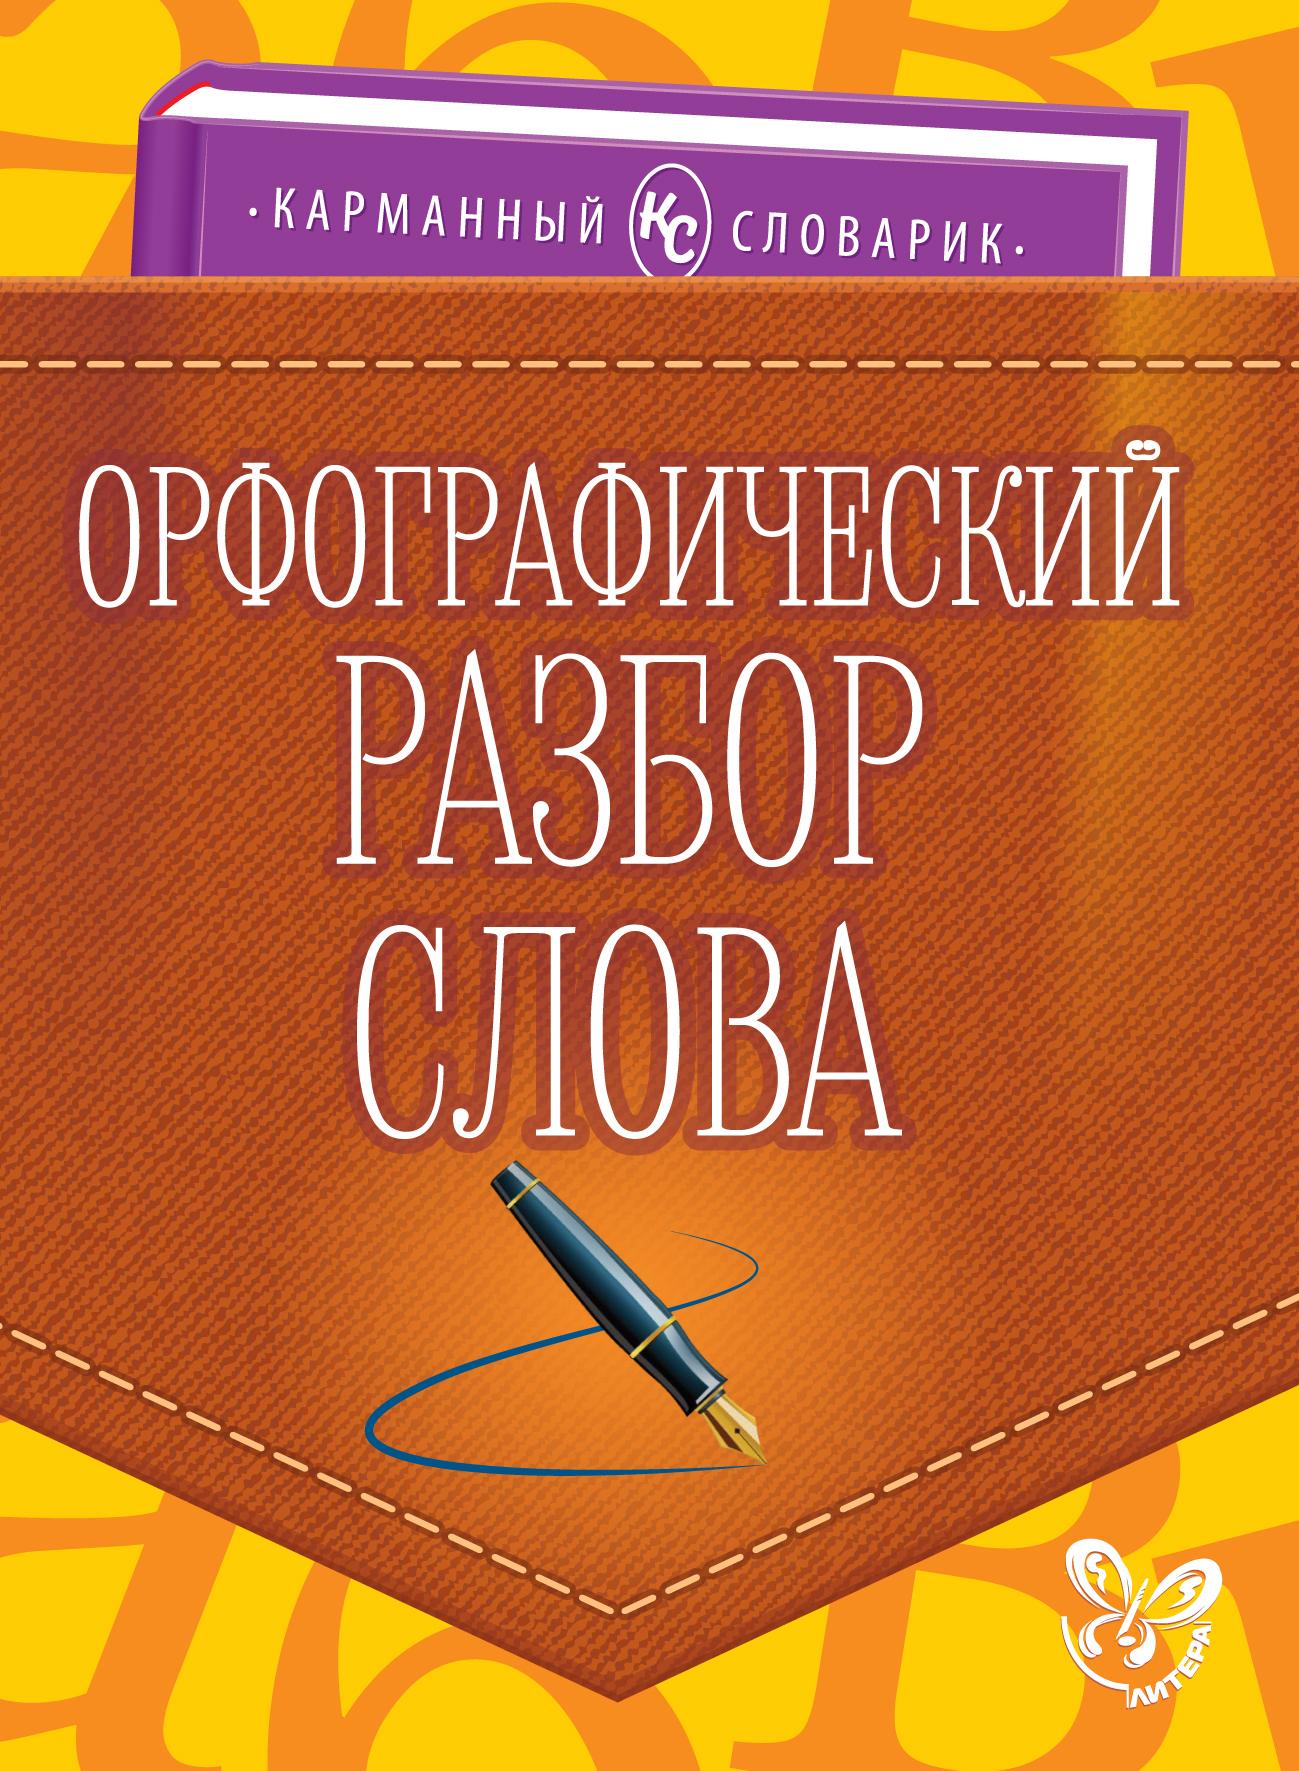 О. Д. Ушакова Орфографический разбор слова цена